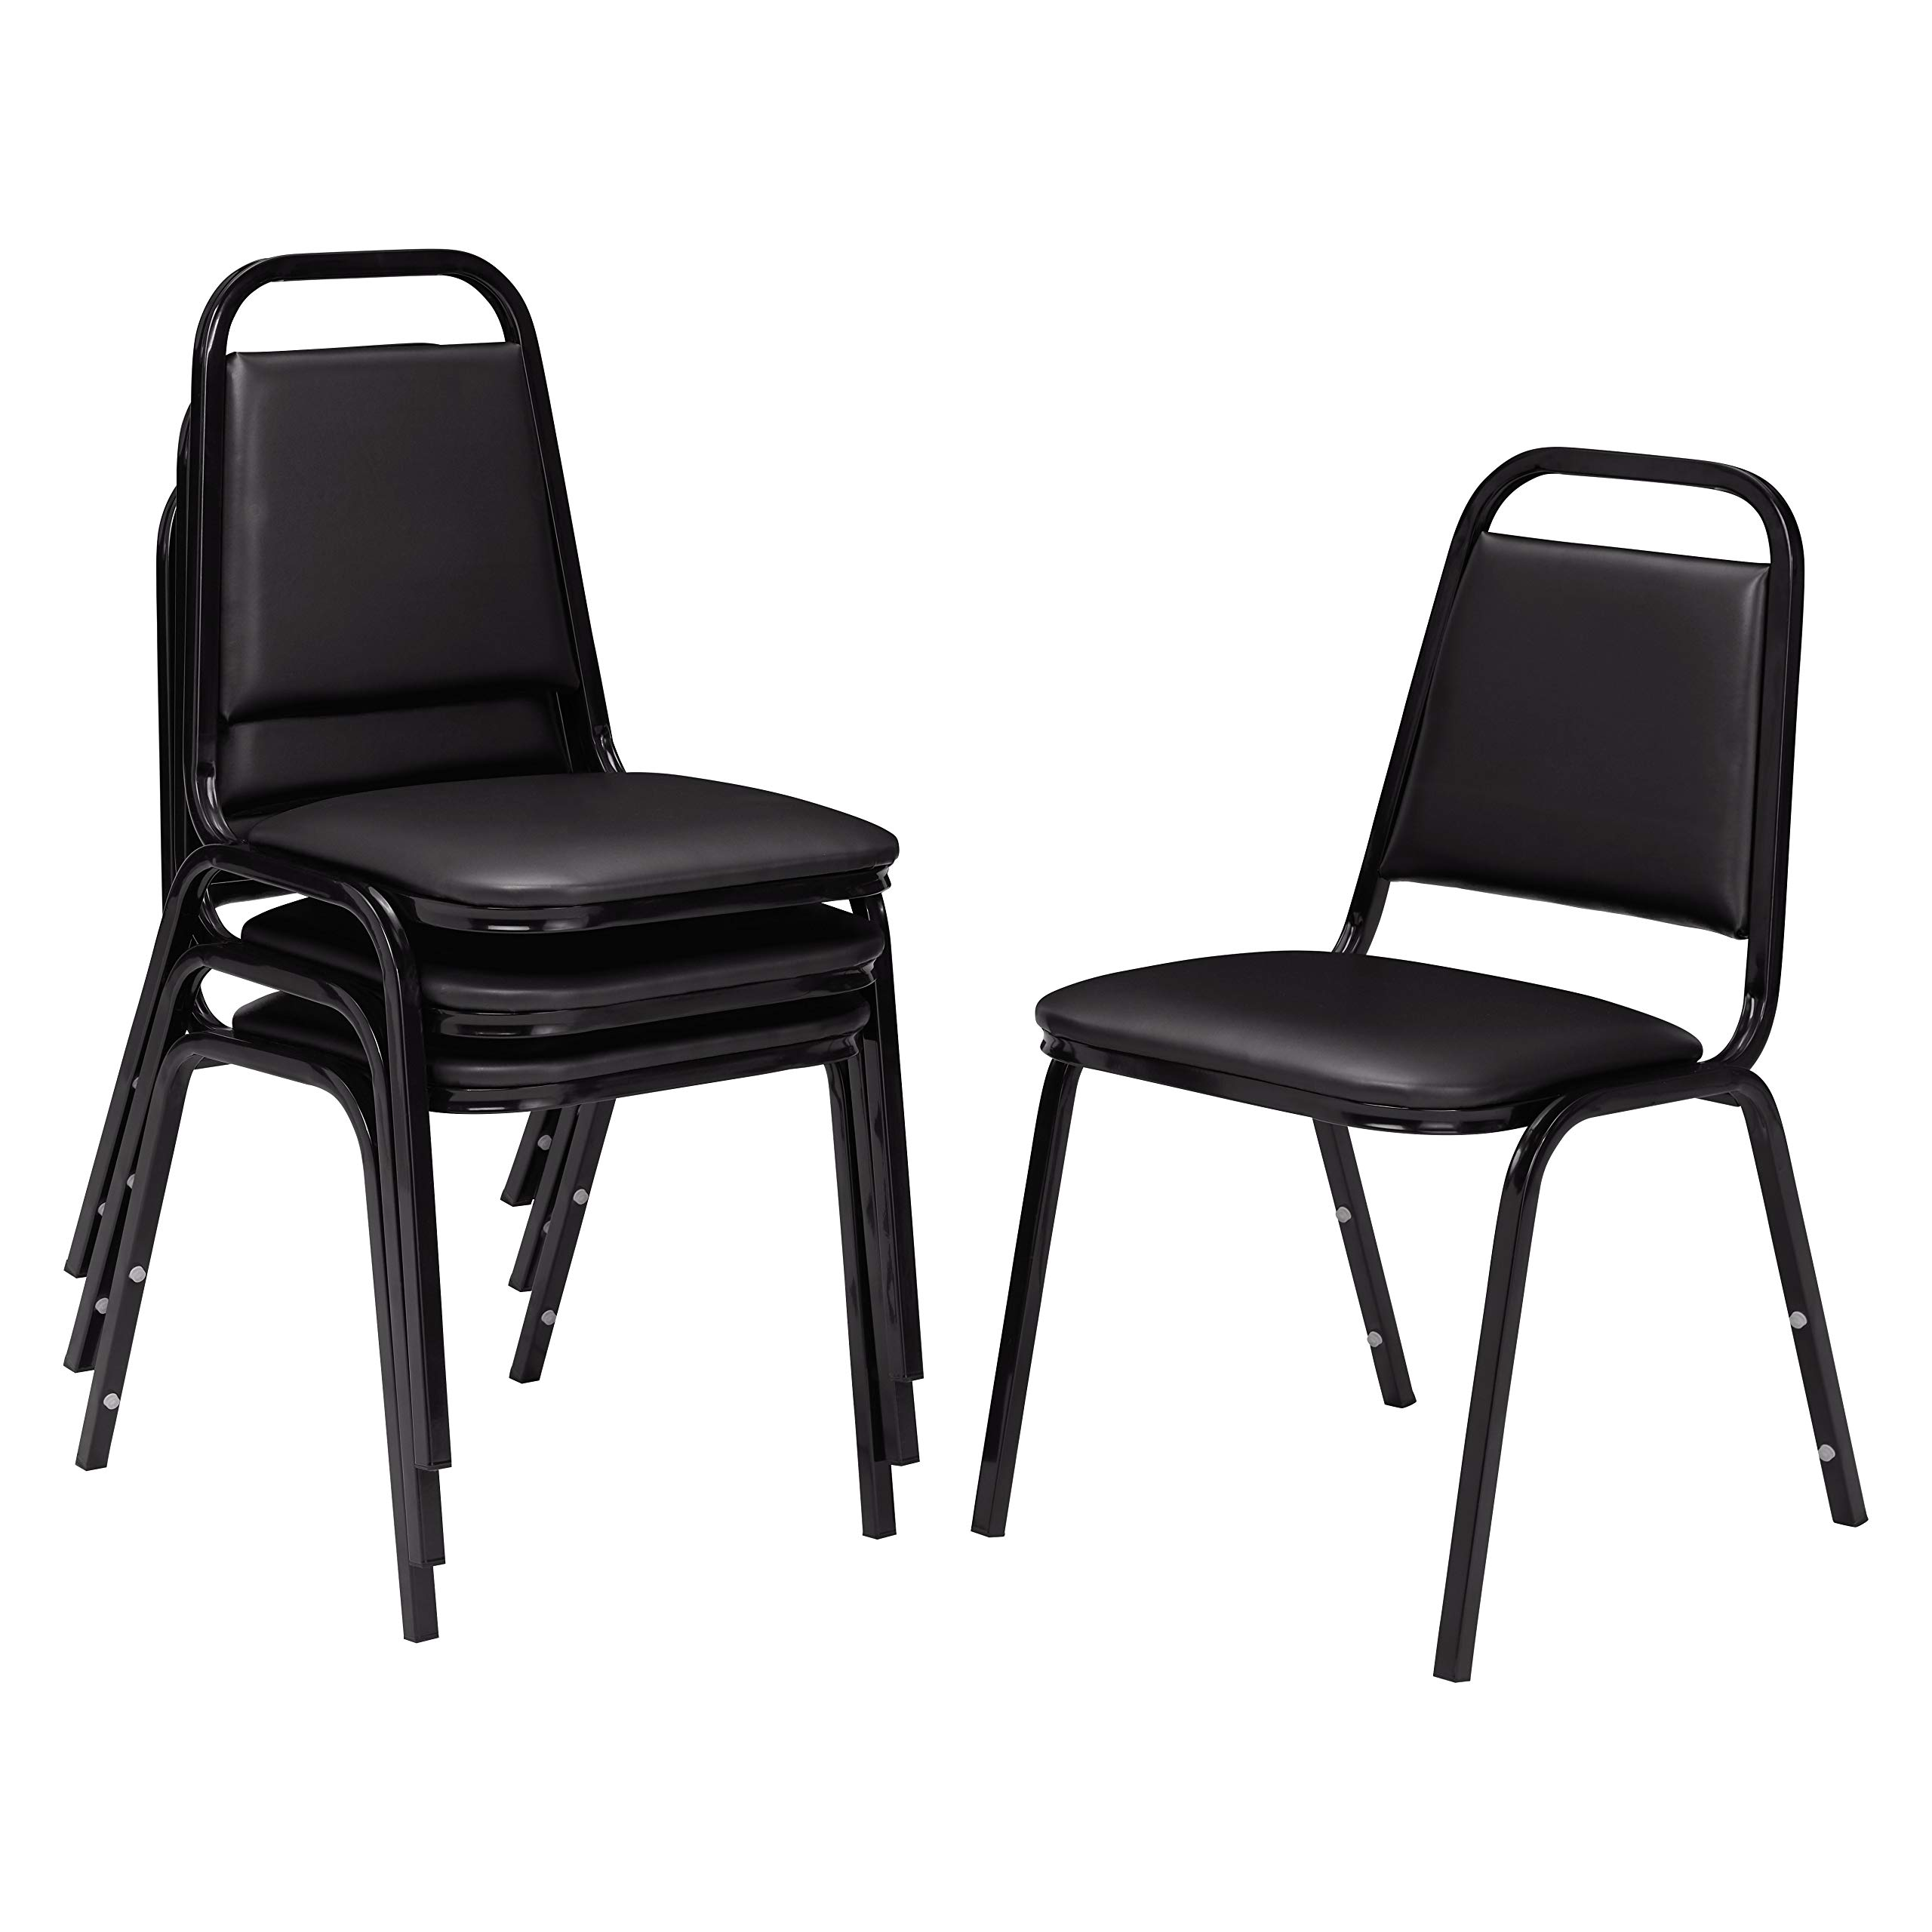 NPS 9110-B-CN Vinyl-upholstered Standard Stack Chair, 300-lb Weight Capacity, 16'' Length x 15-3/4'' Width x 33'' Height, Black (Carton of 4)